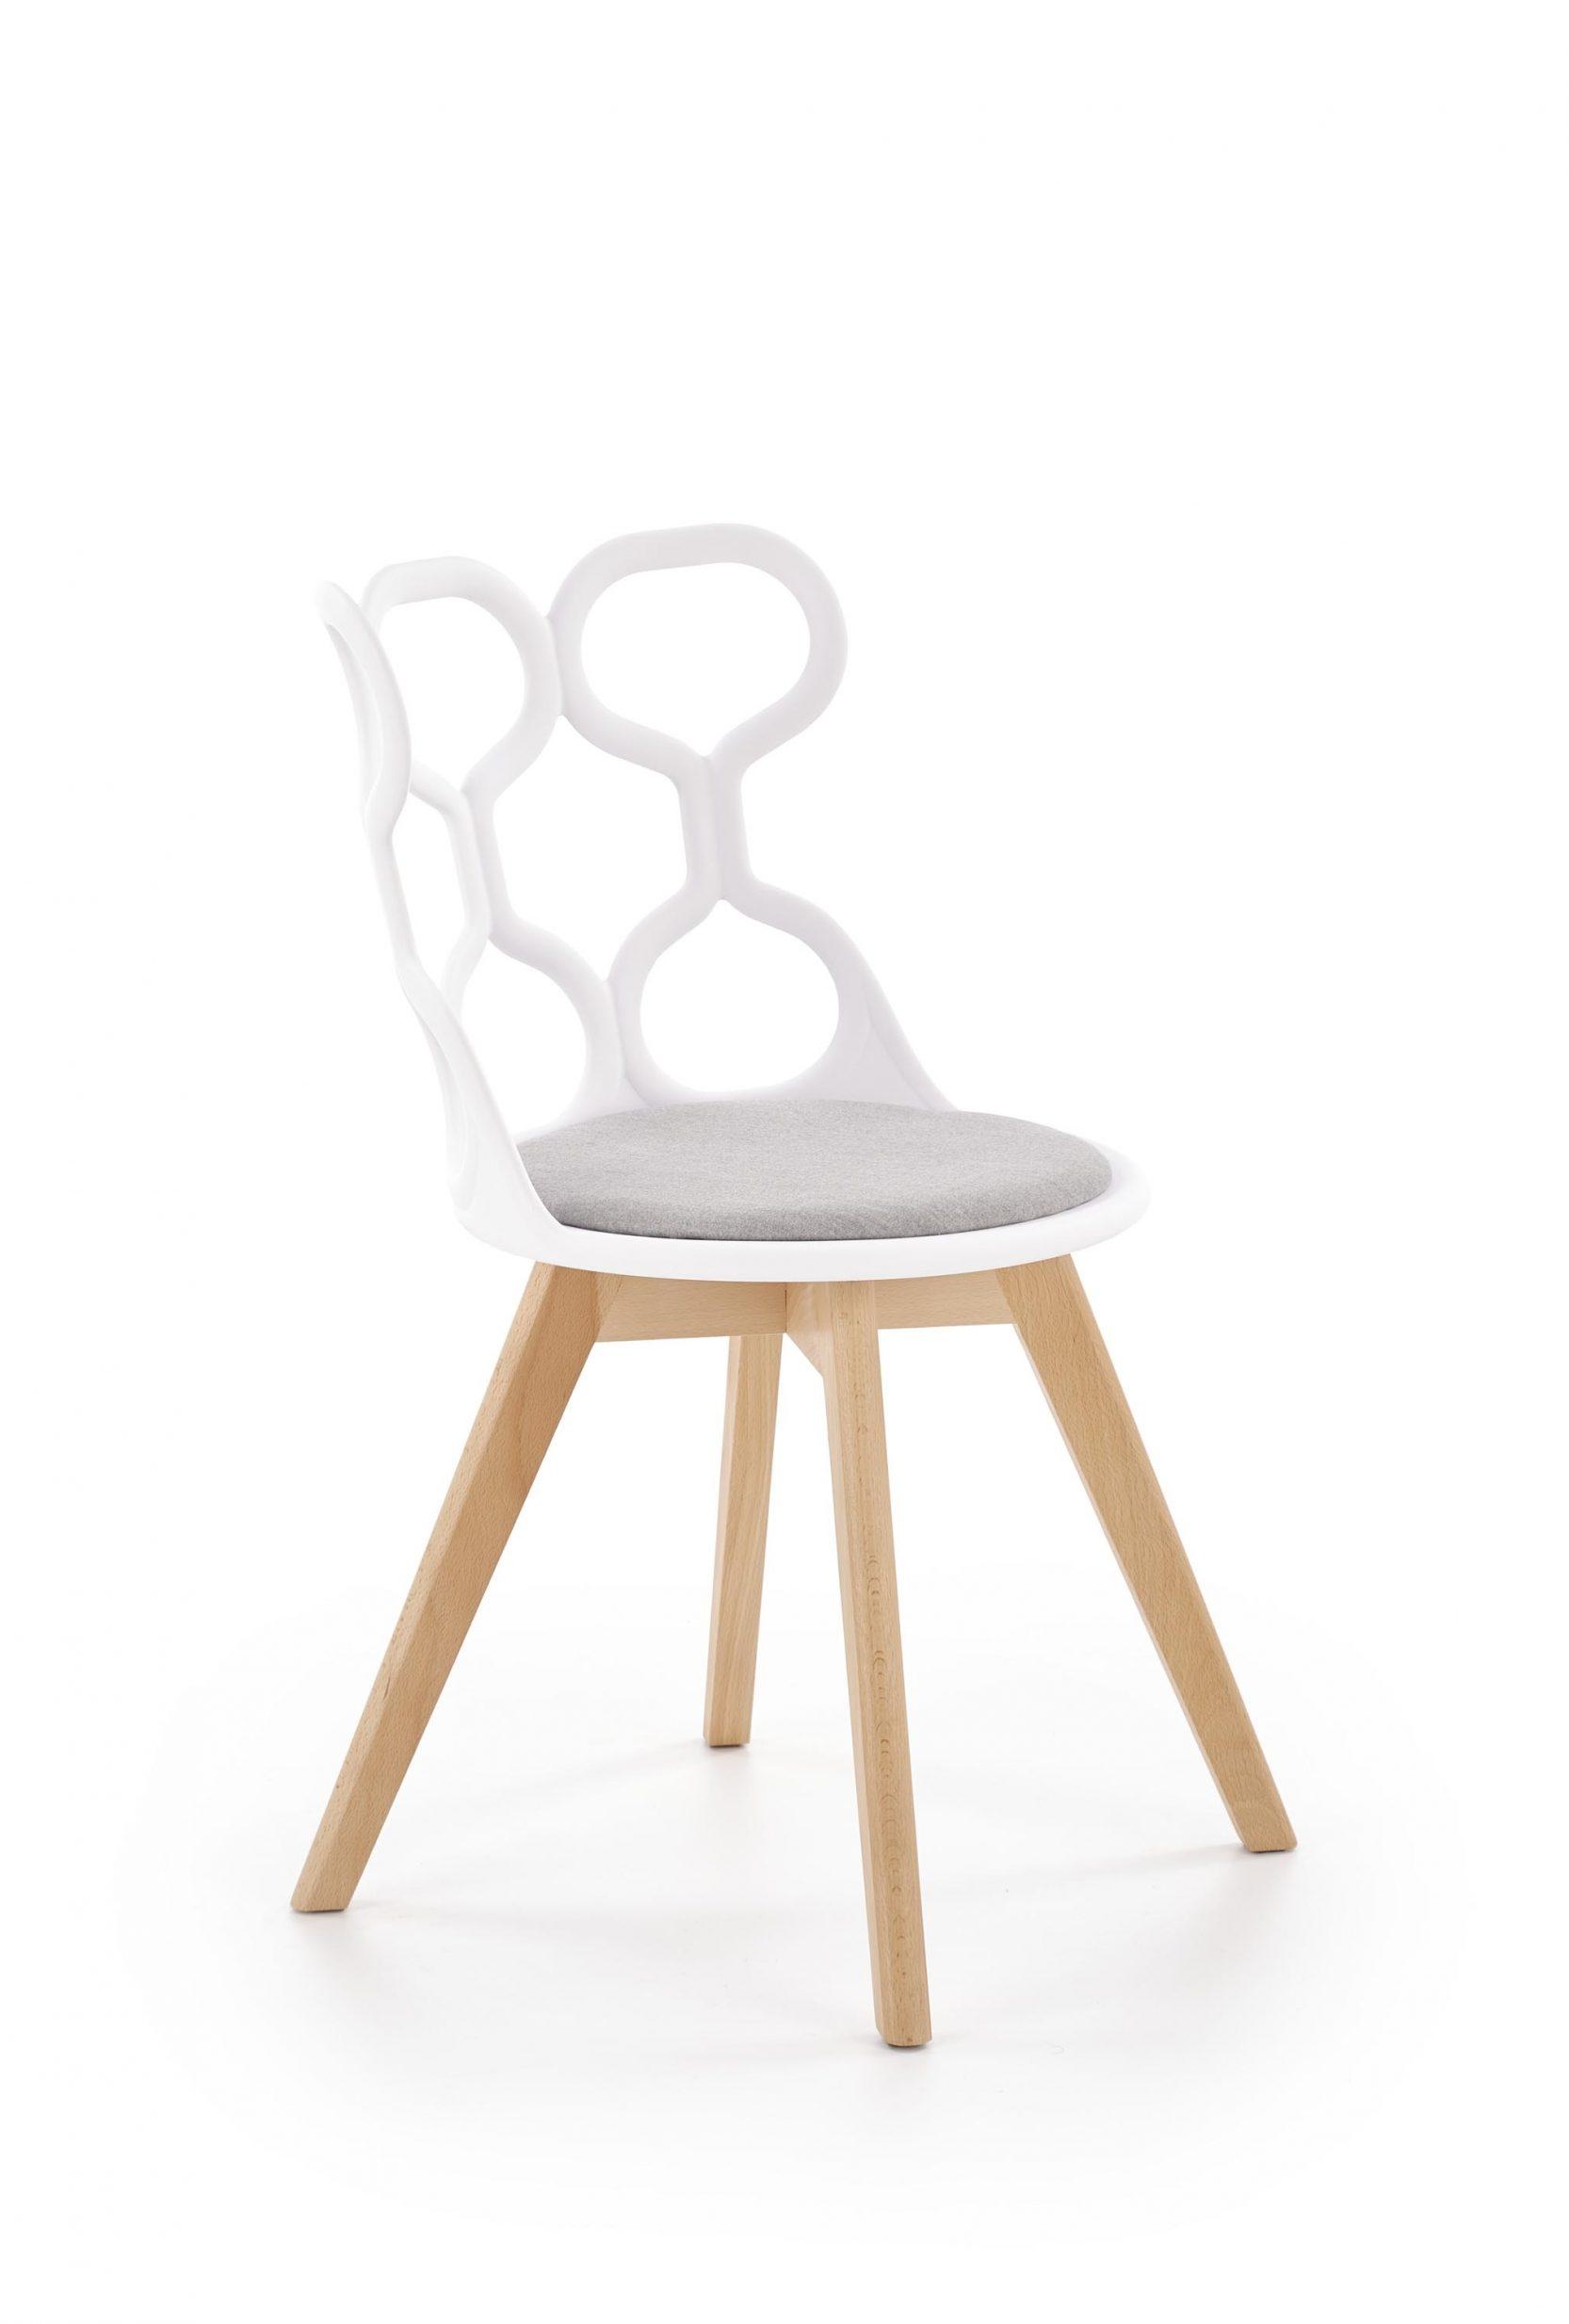 Scaun din plastic, cu sezut tapitat cu stofa si picioare din lemn K308 Alb / Gri / Natural, l43xA50xH80 cm